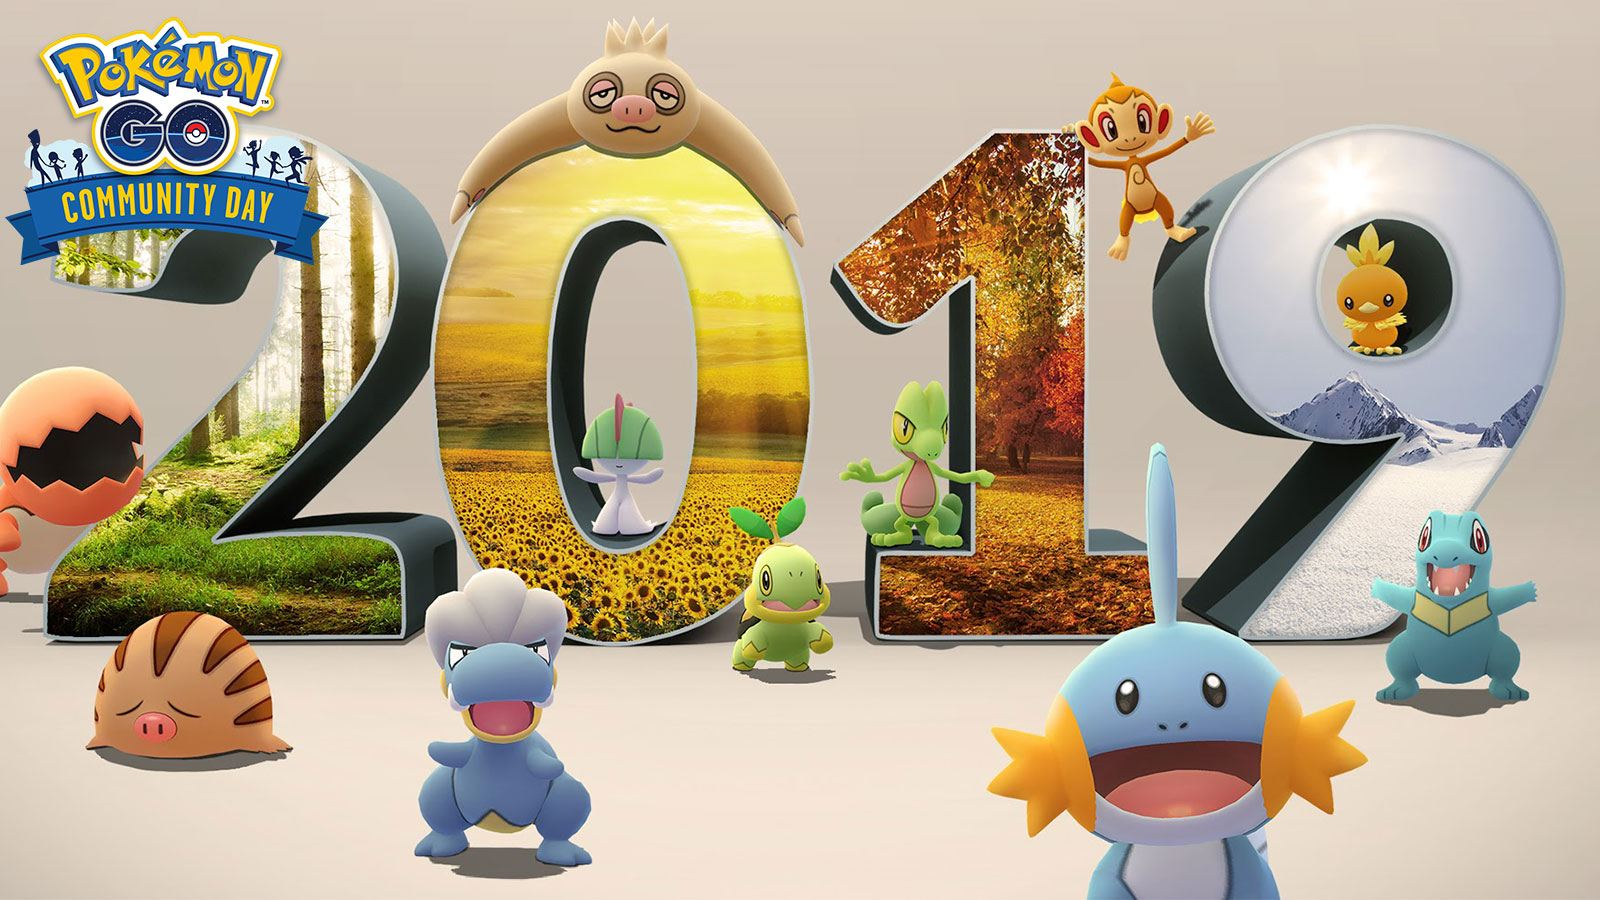 PokemonGoLive.com